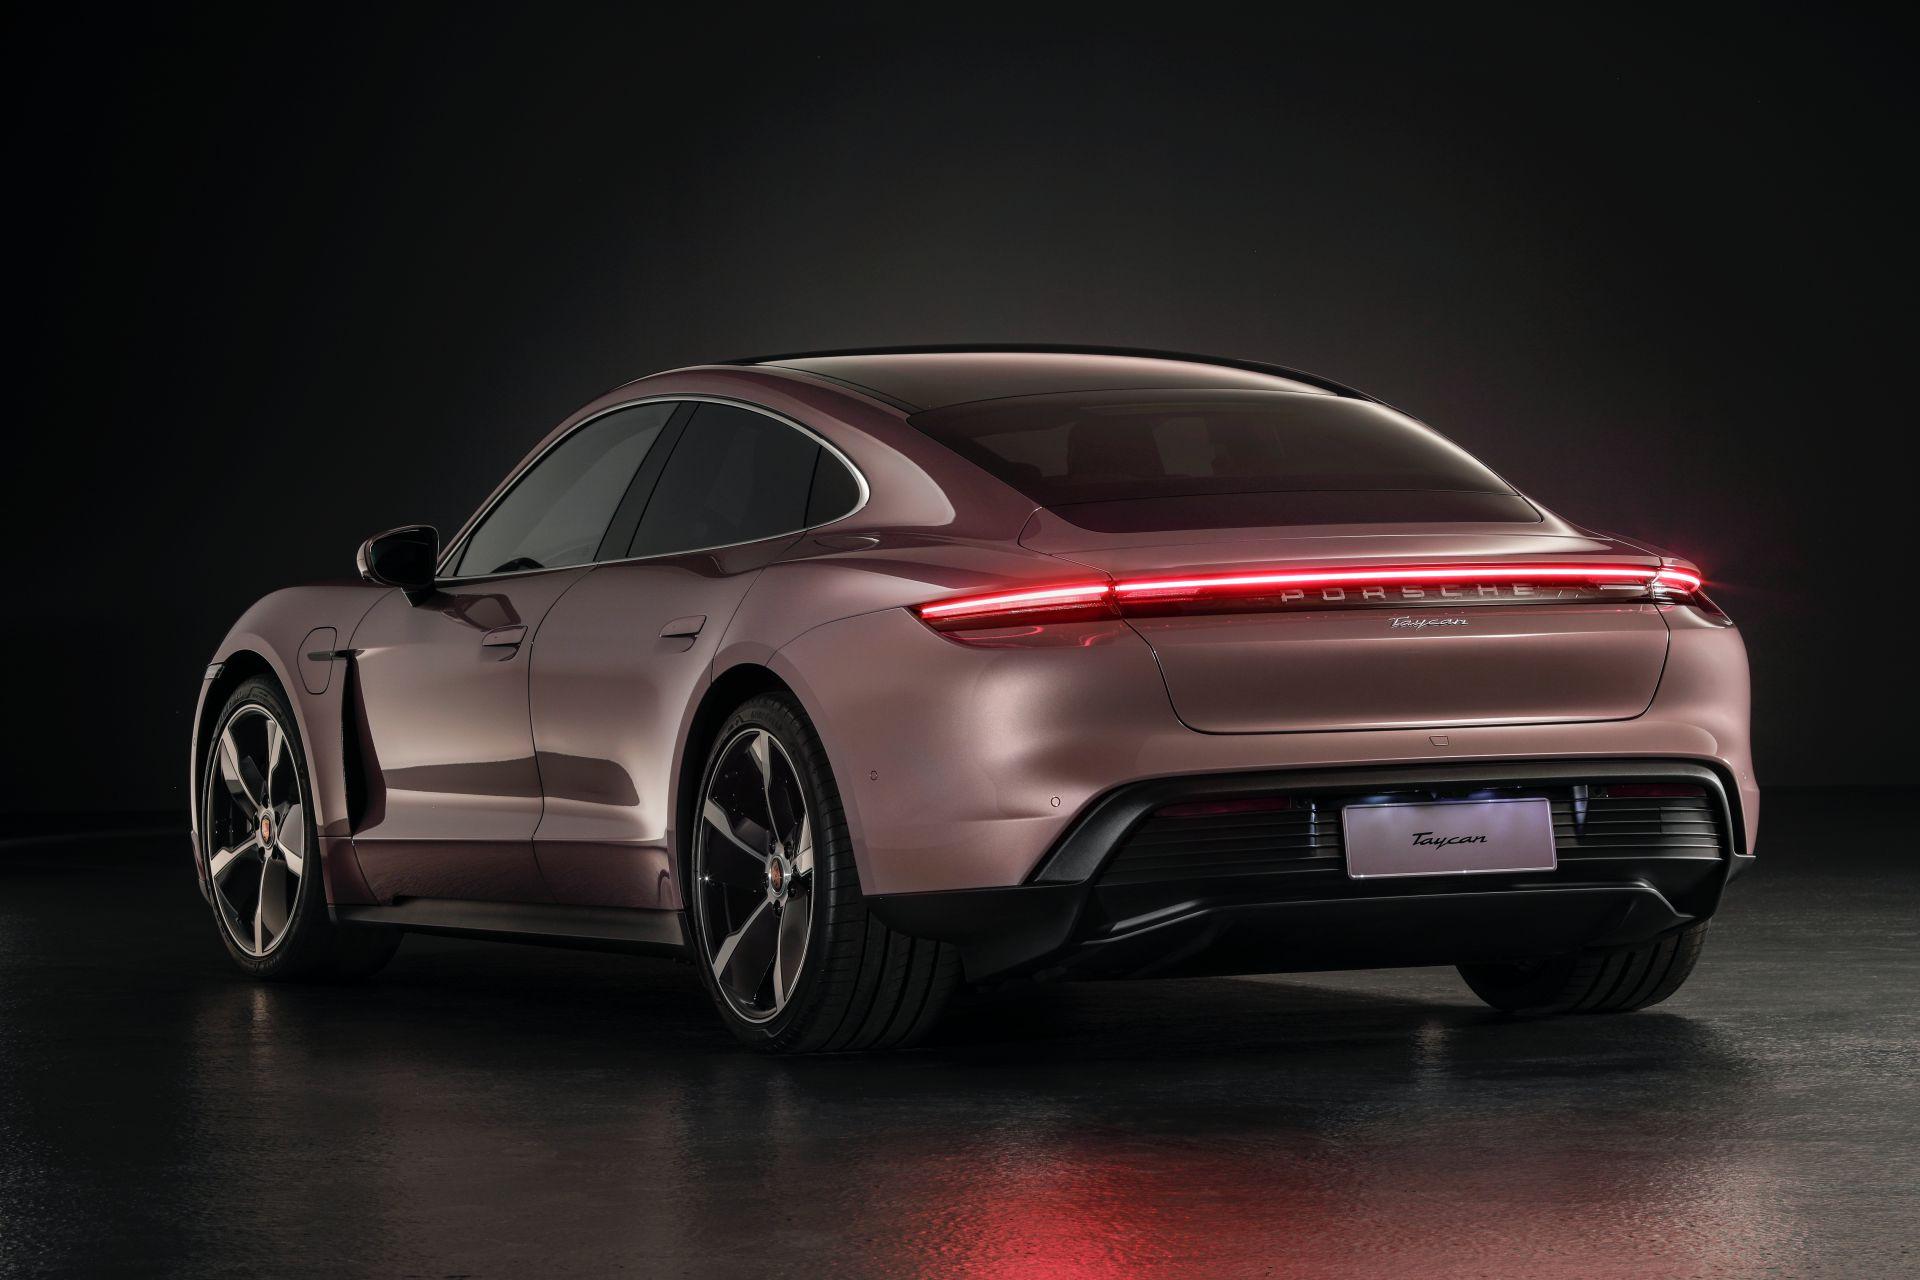 Porsche-Taycan-RWD-Base-8